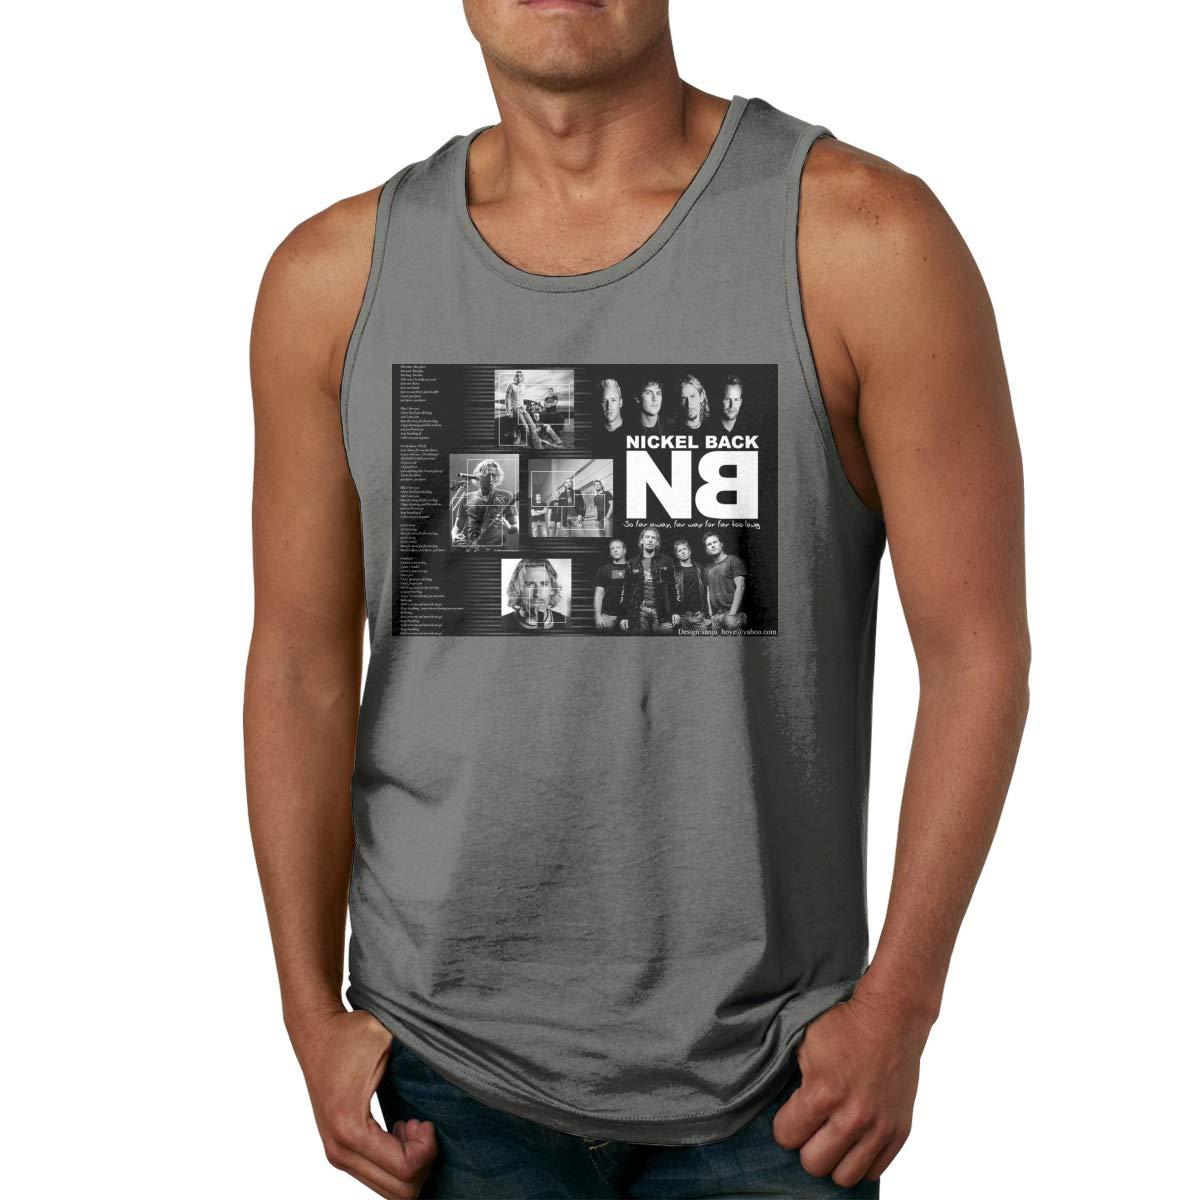 S Sport Gym Tank Top Nickelback Sleeveless T Shirts